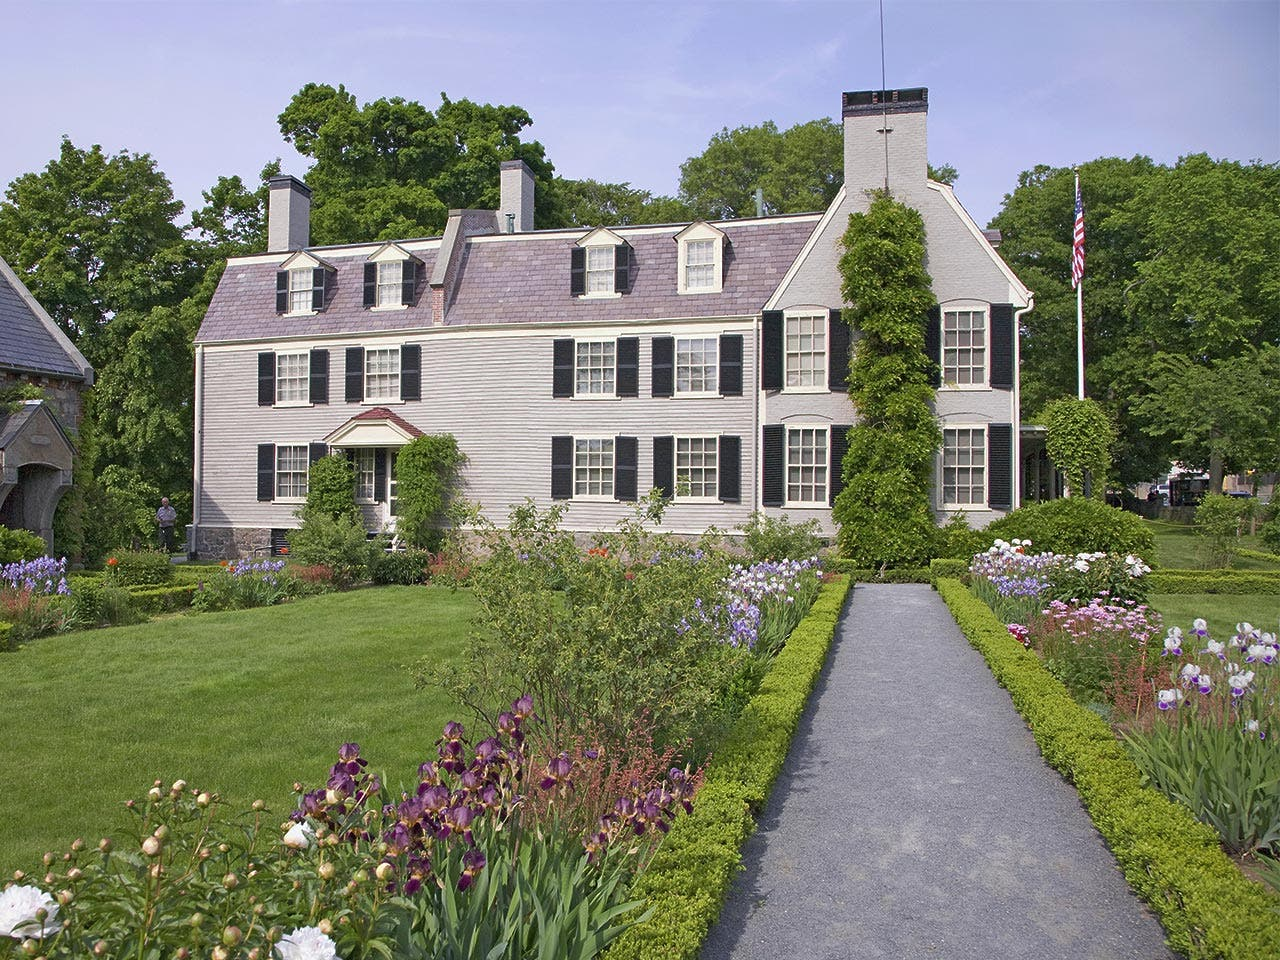 House of John Adams | Joseph Sohm/Shutterstock.com